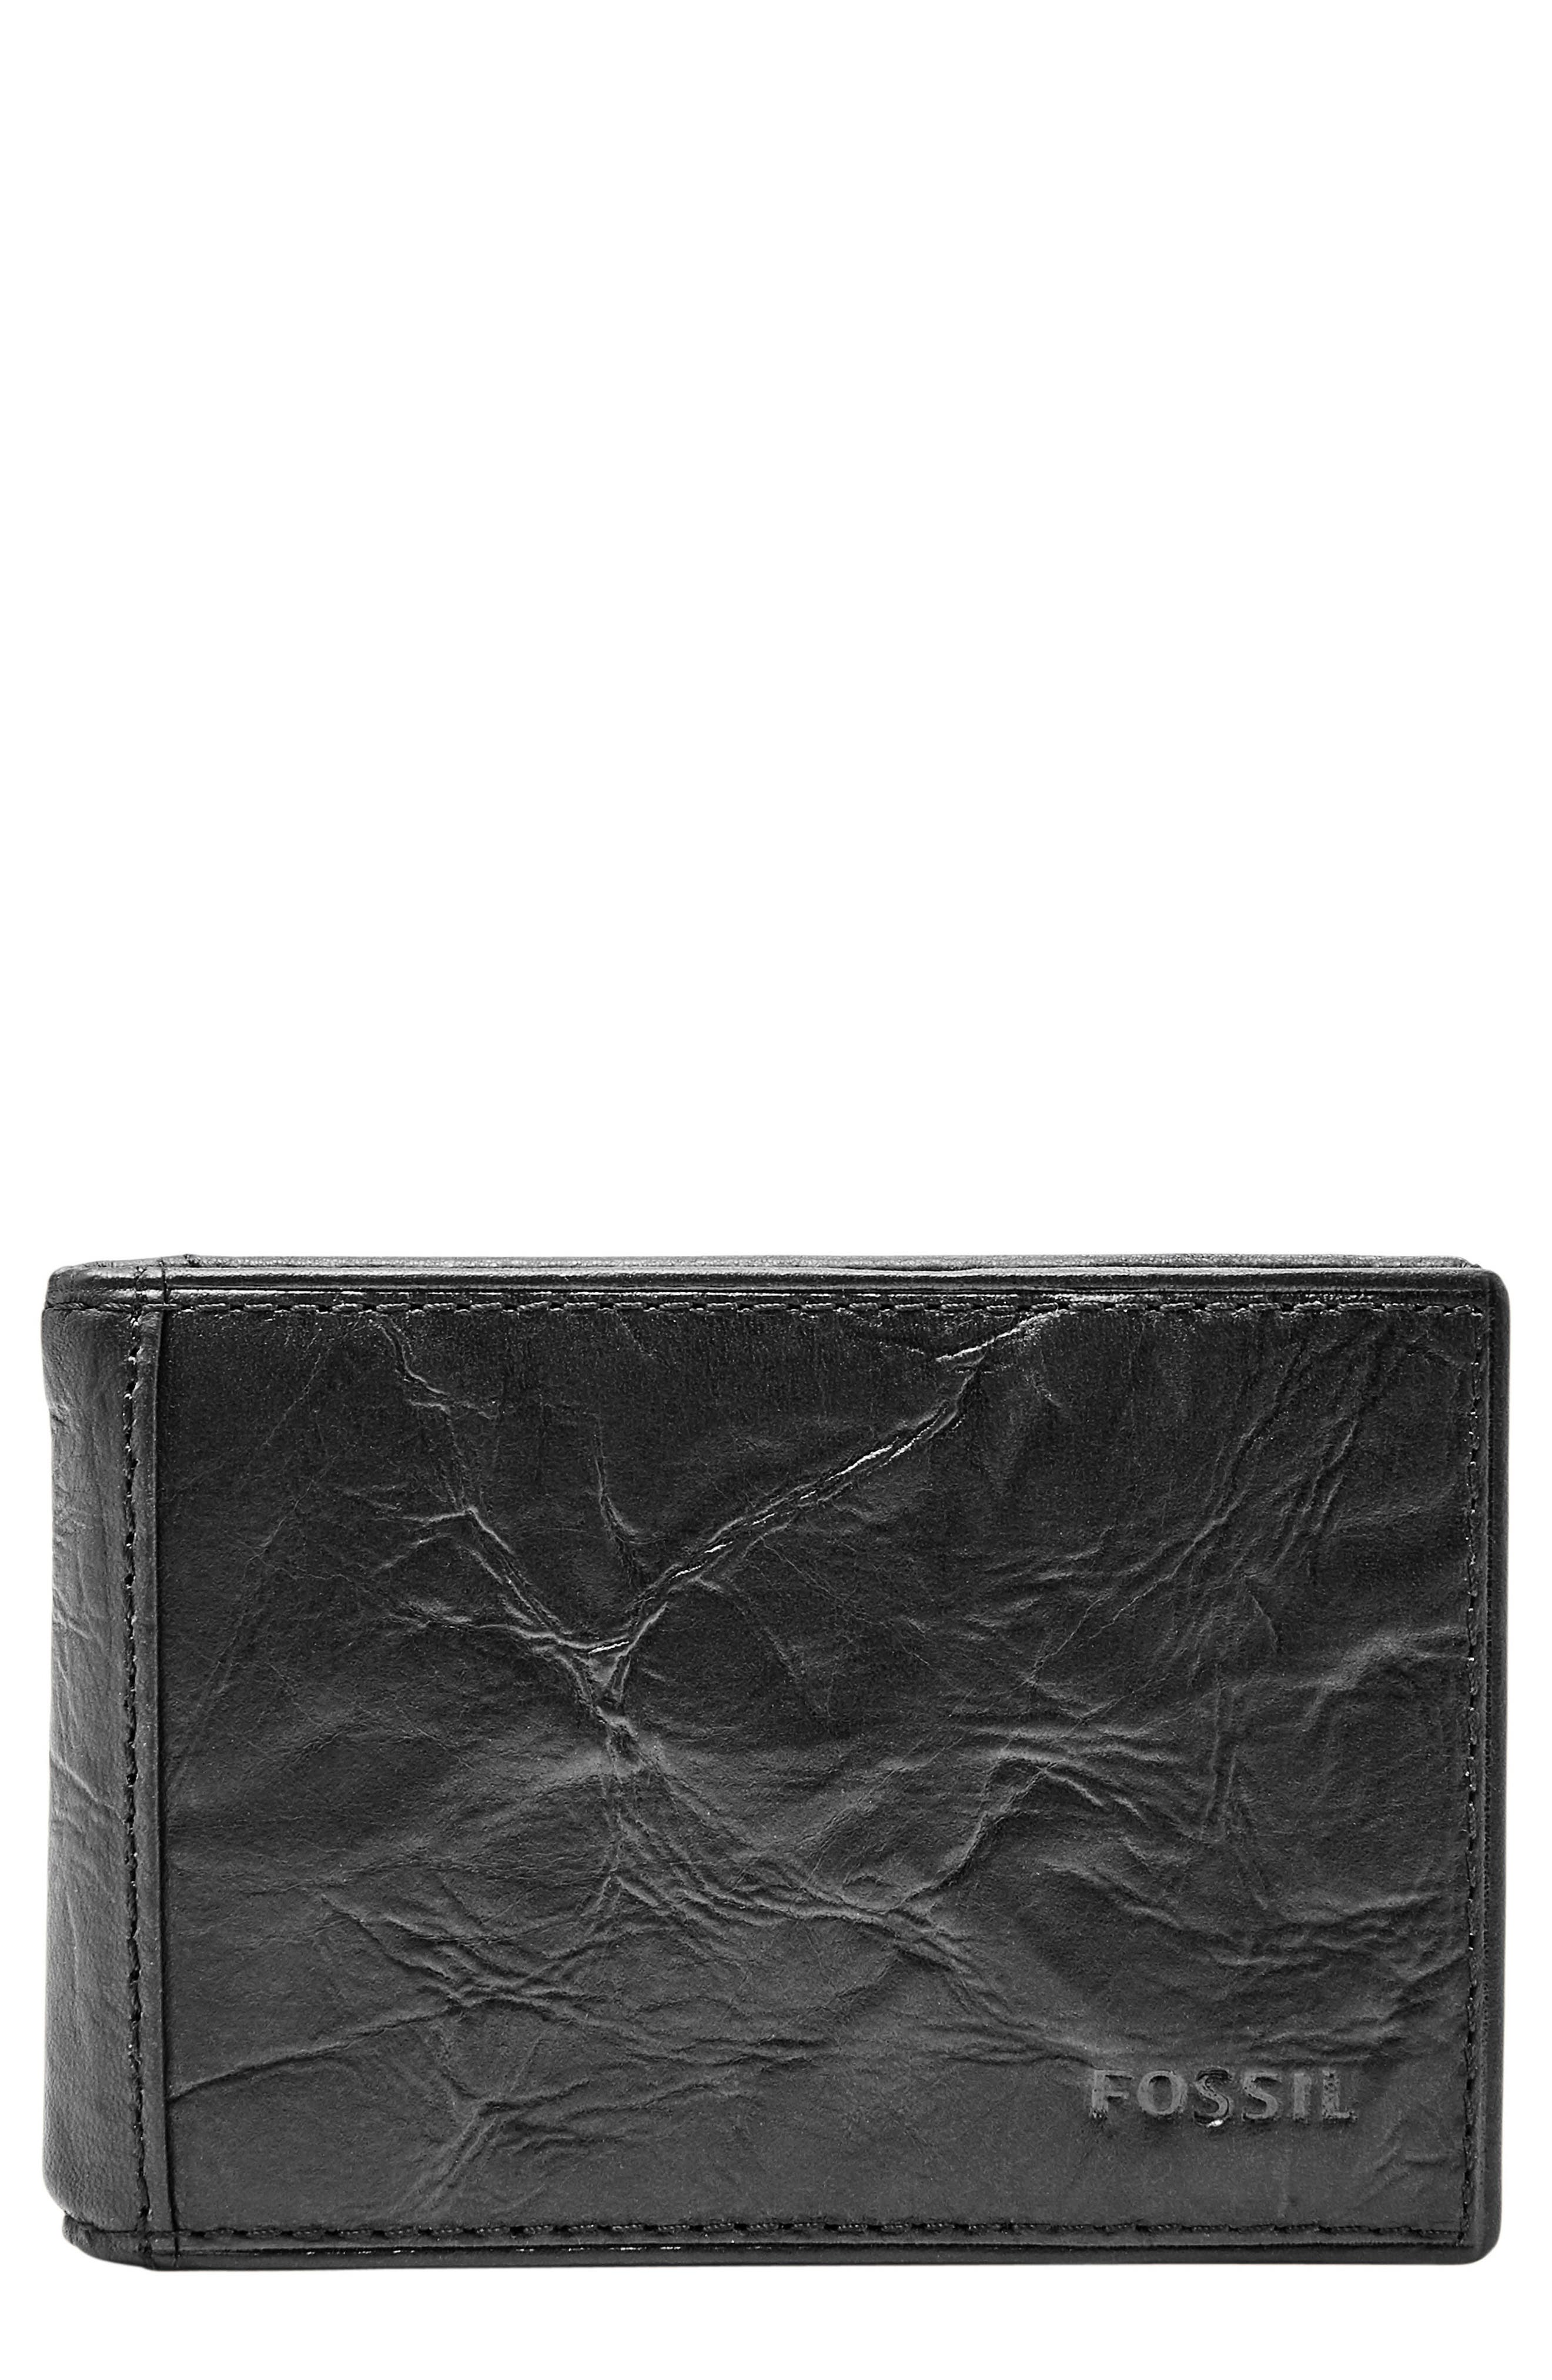 Fossil Neel Leather Money Clip Wallet